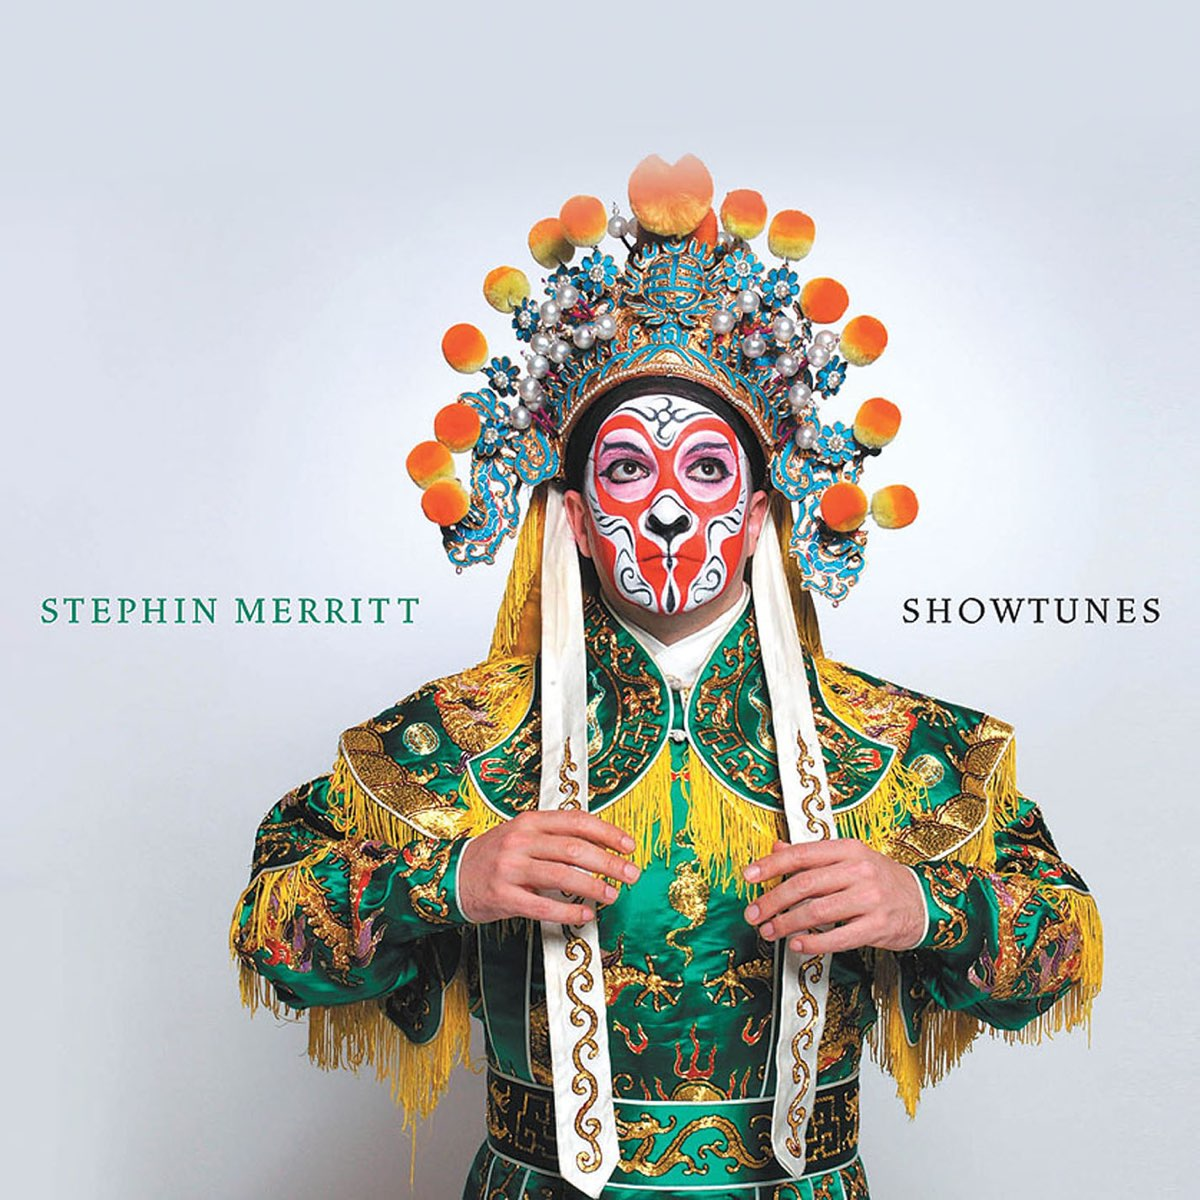 Stephin Merritt, Showtunes